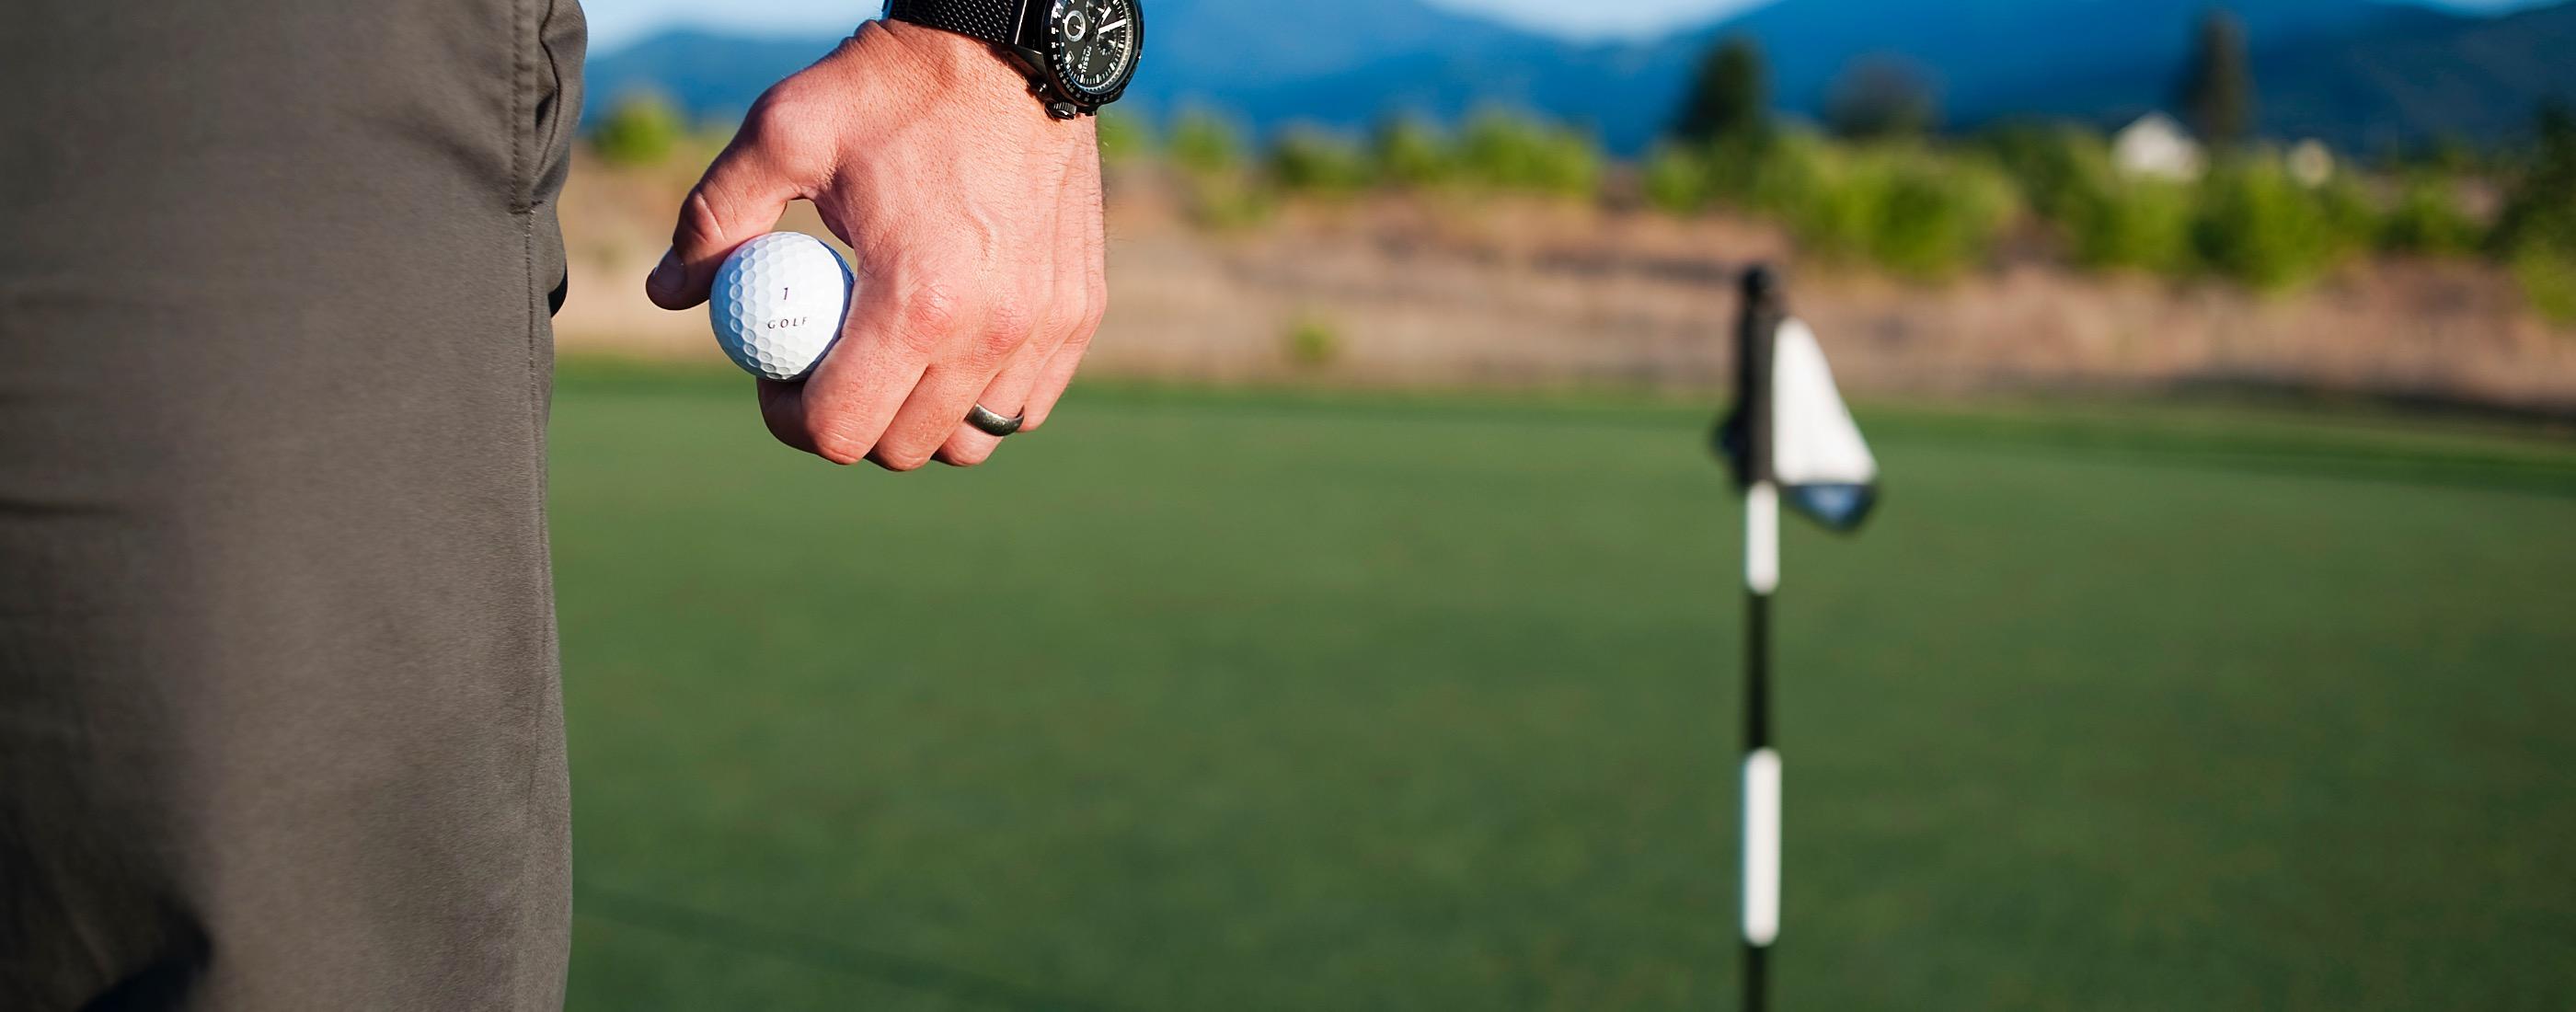 Golfing in Medford, Oregon